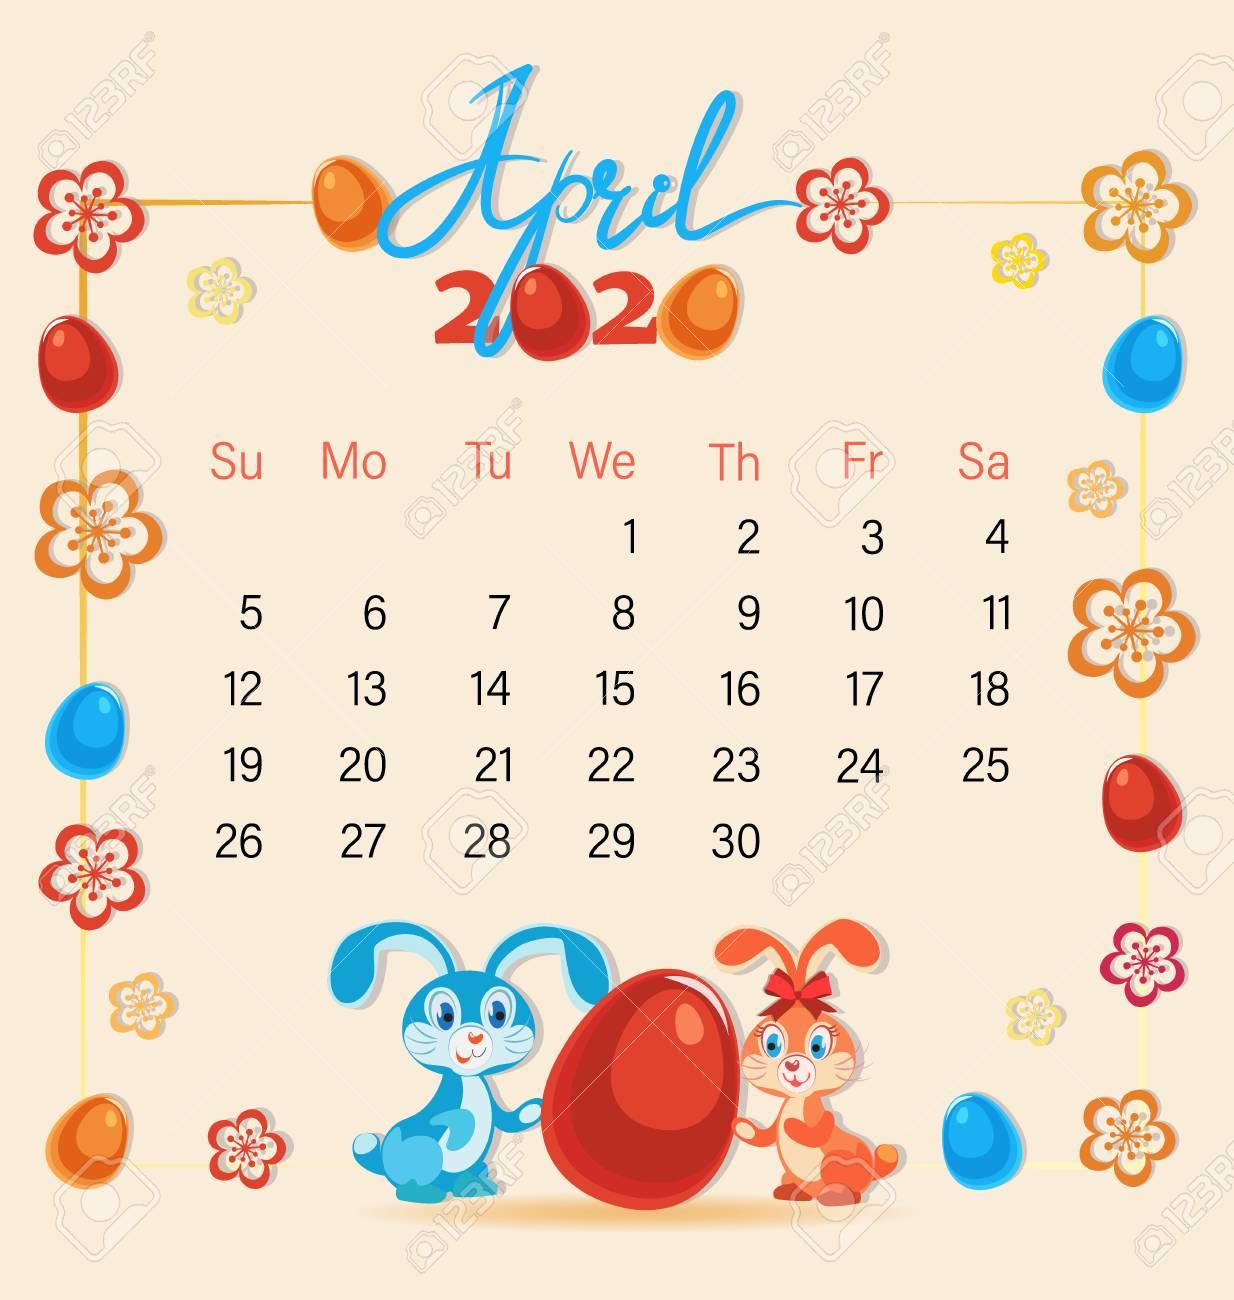 Easter 2020 Calendar.Festive April With Cute Easter Bunnies Calendar 2020 Easter